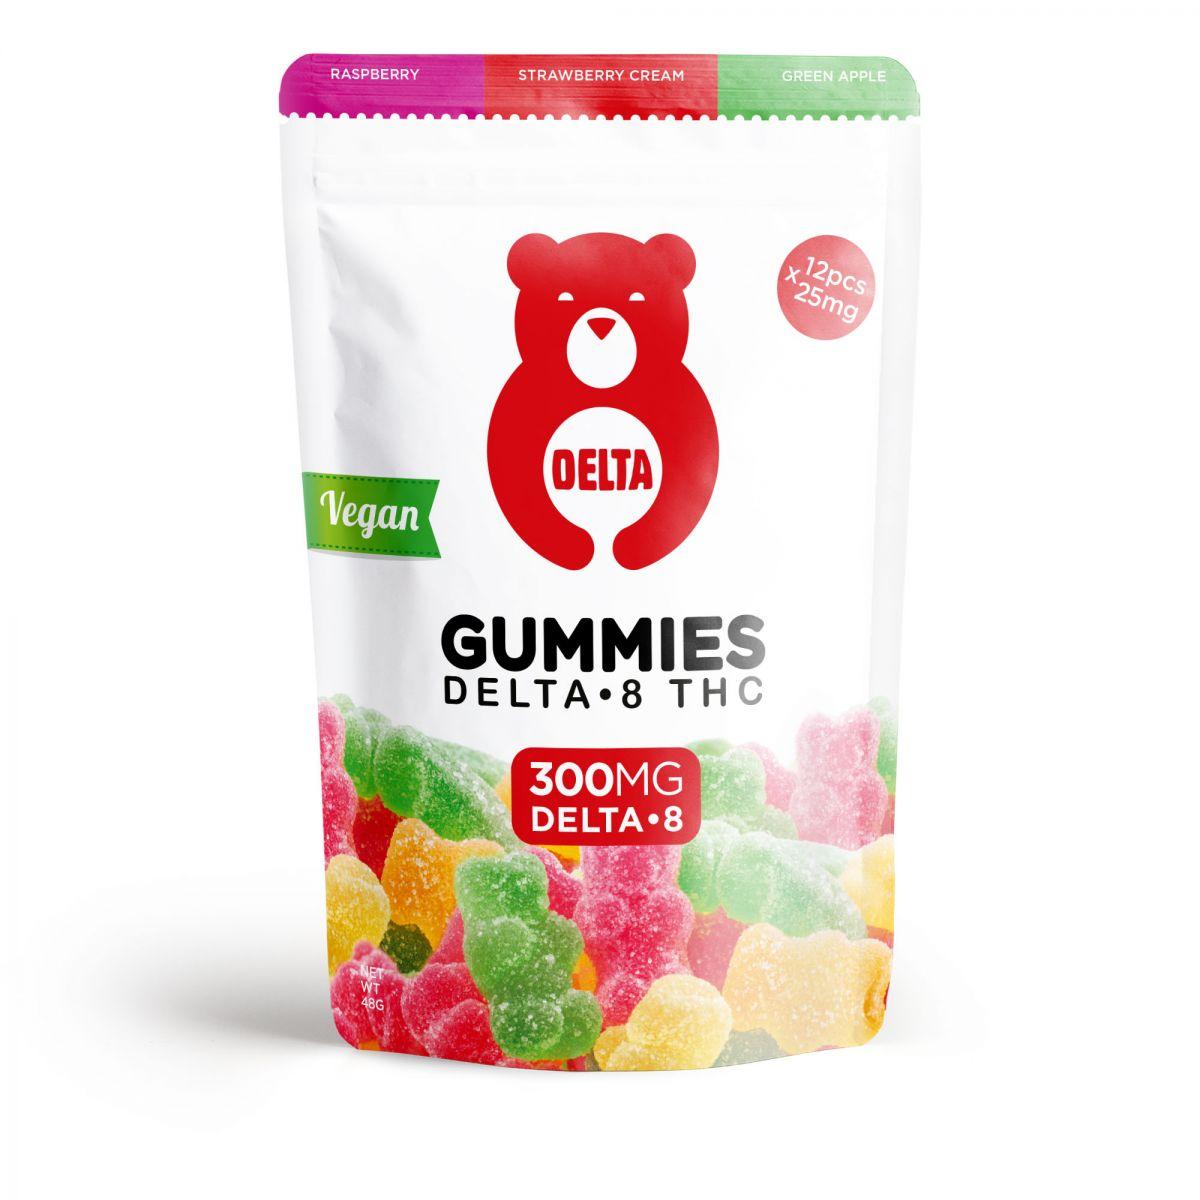 delta-8-thc-gummy-bears-vegan-red-bear-assortment-raspberry-strawberry-cream-green-apple-300mg